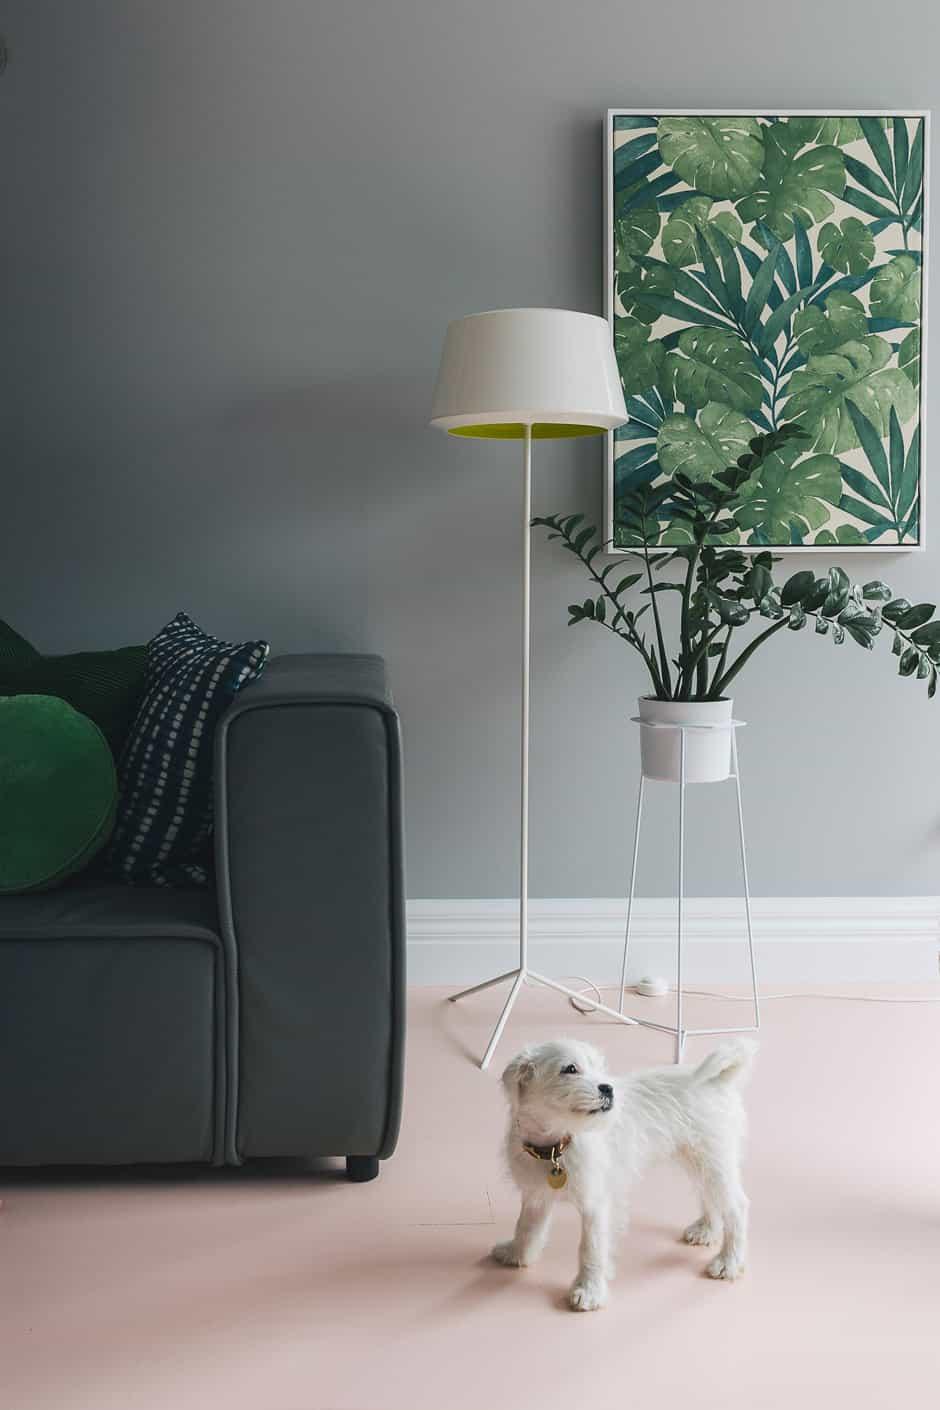 alex_fulton_home_renovation_homestyle_9